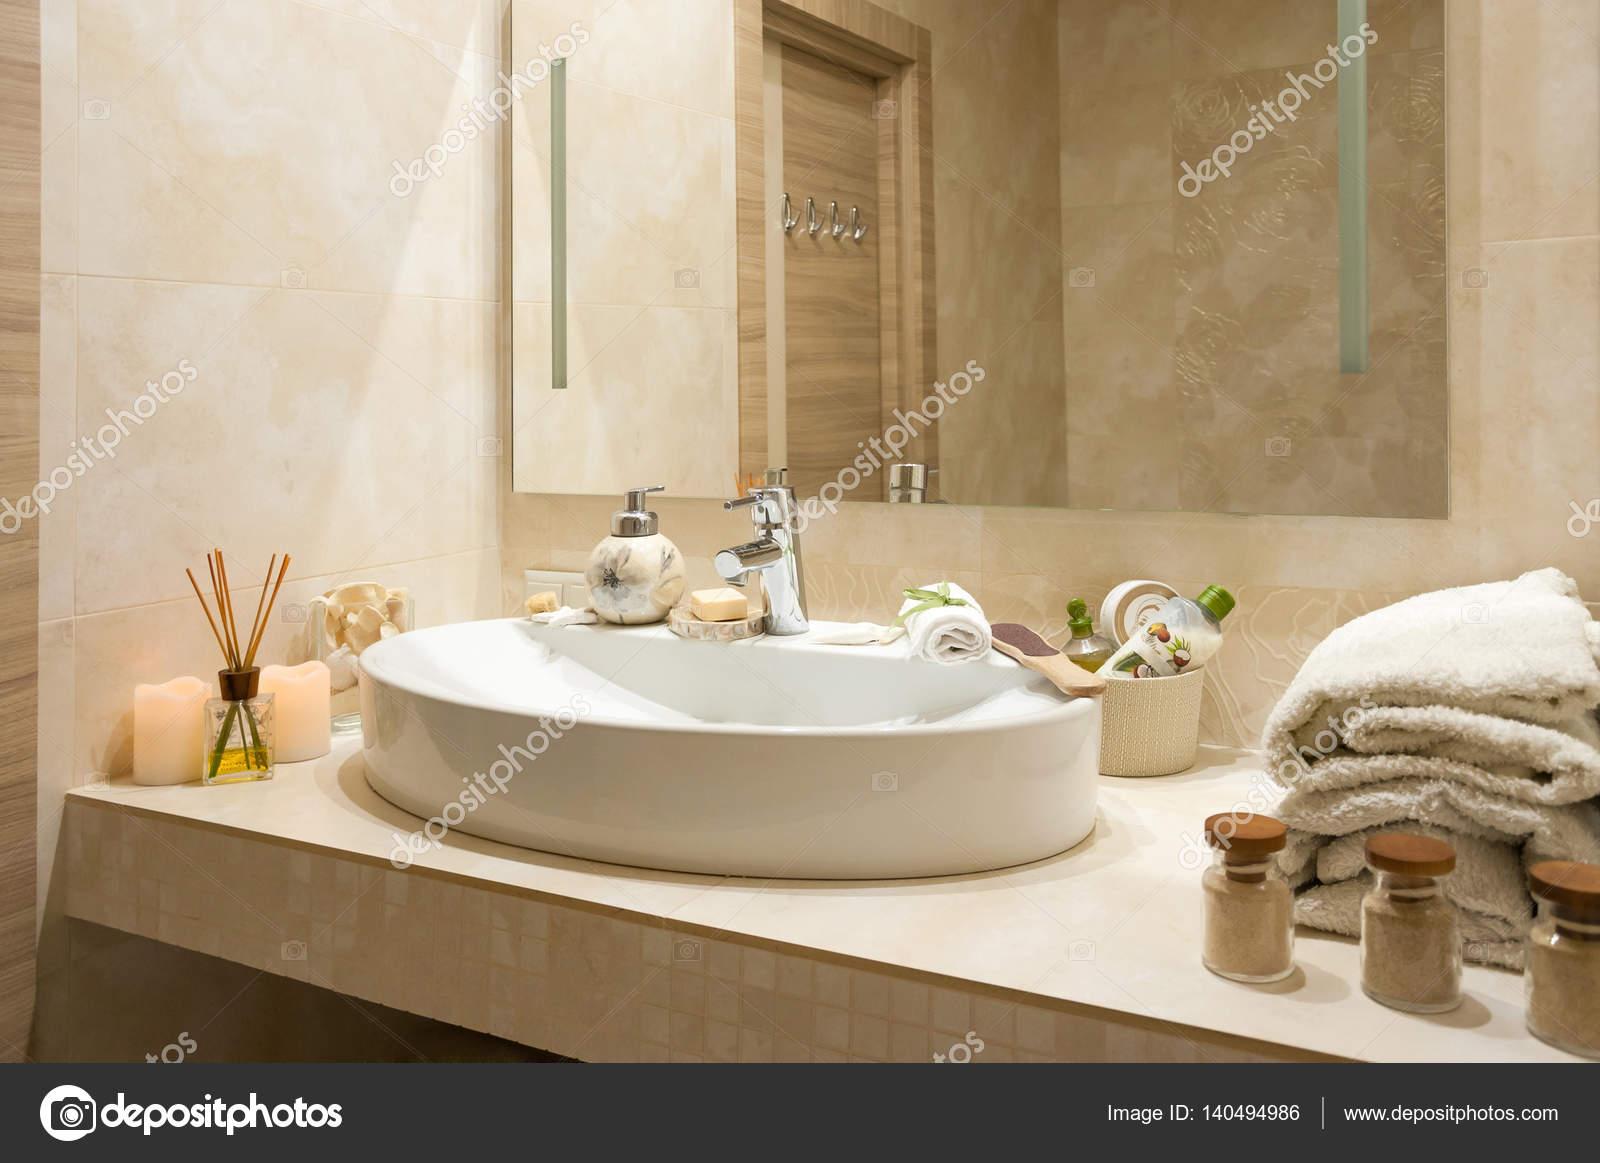 Badkamer interieur met samenstelling van kuur met handdoeken ...